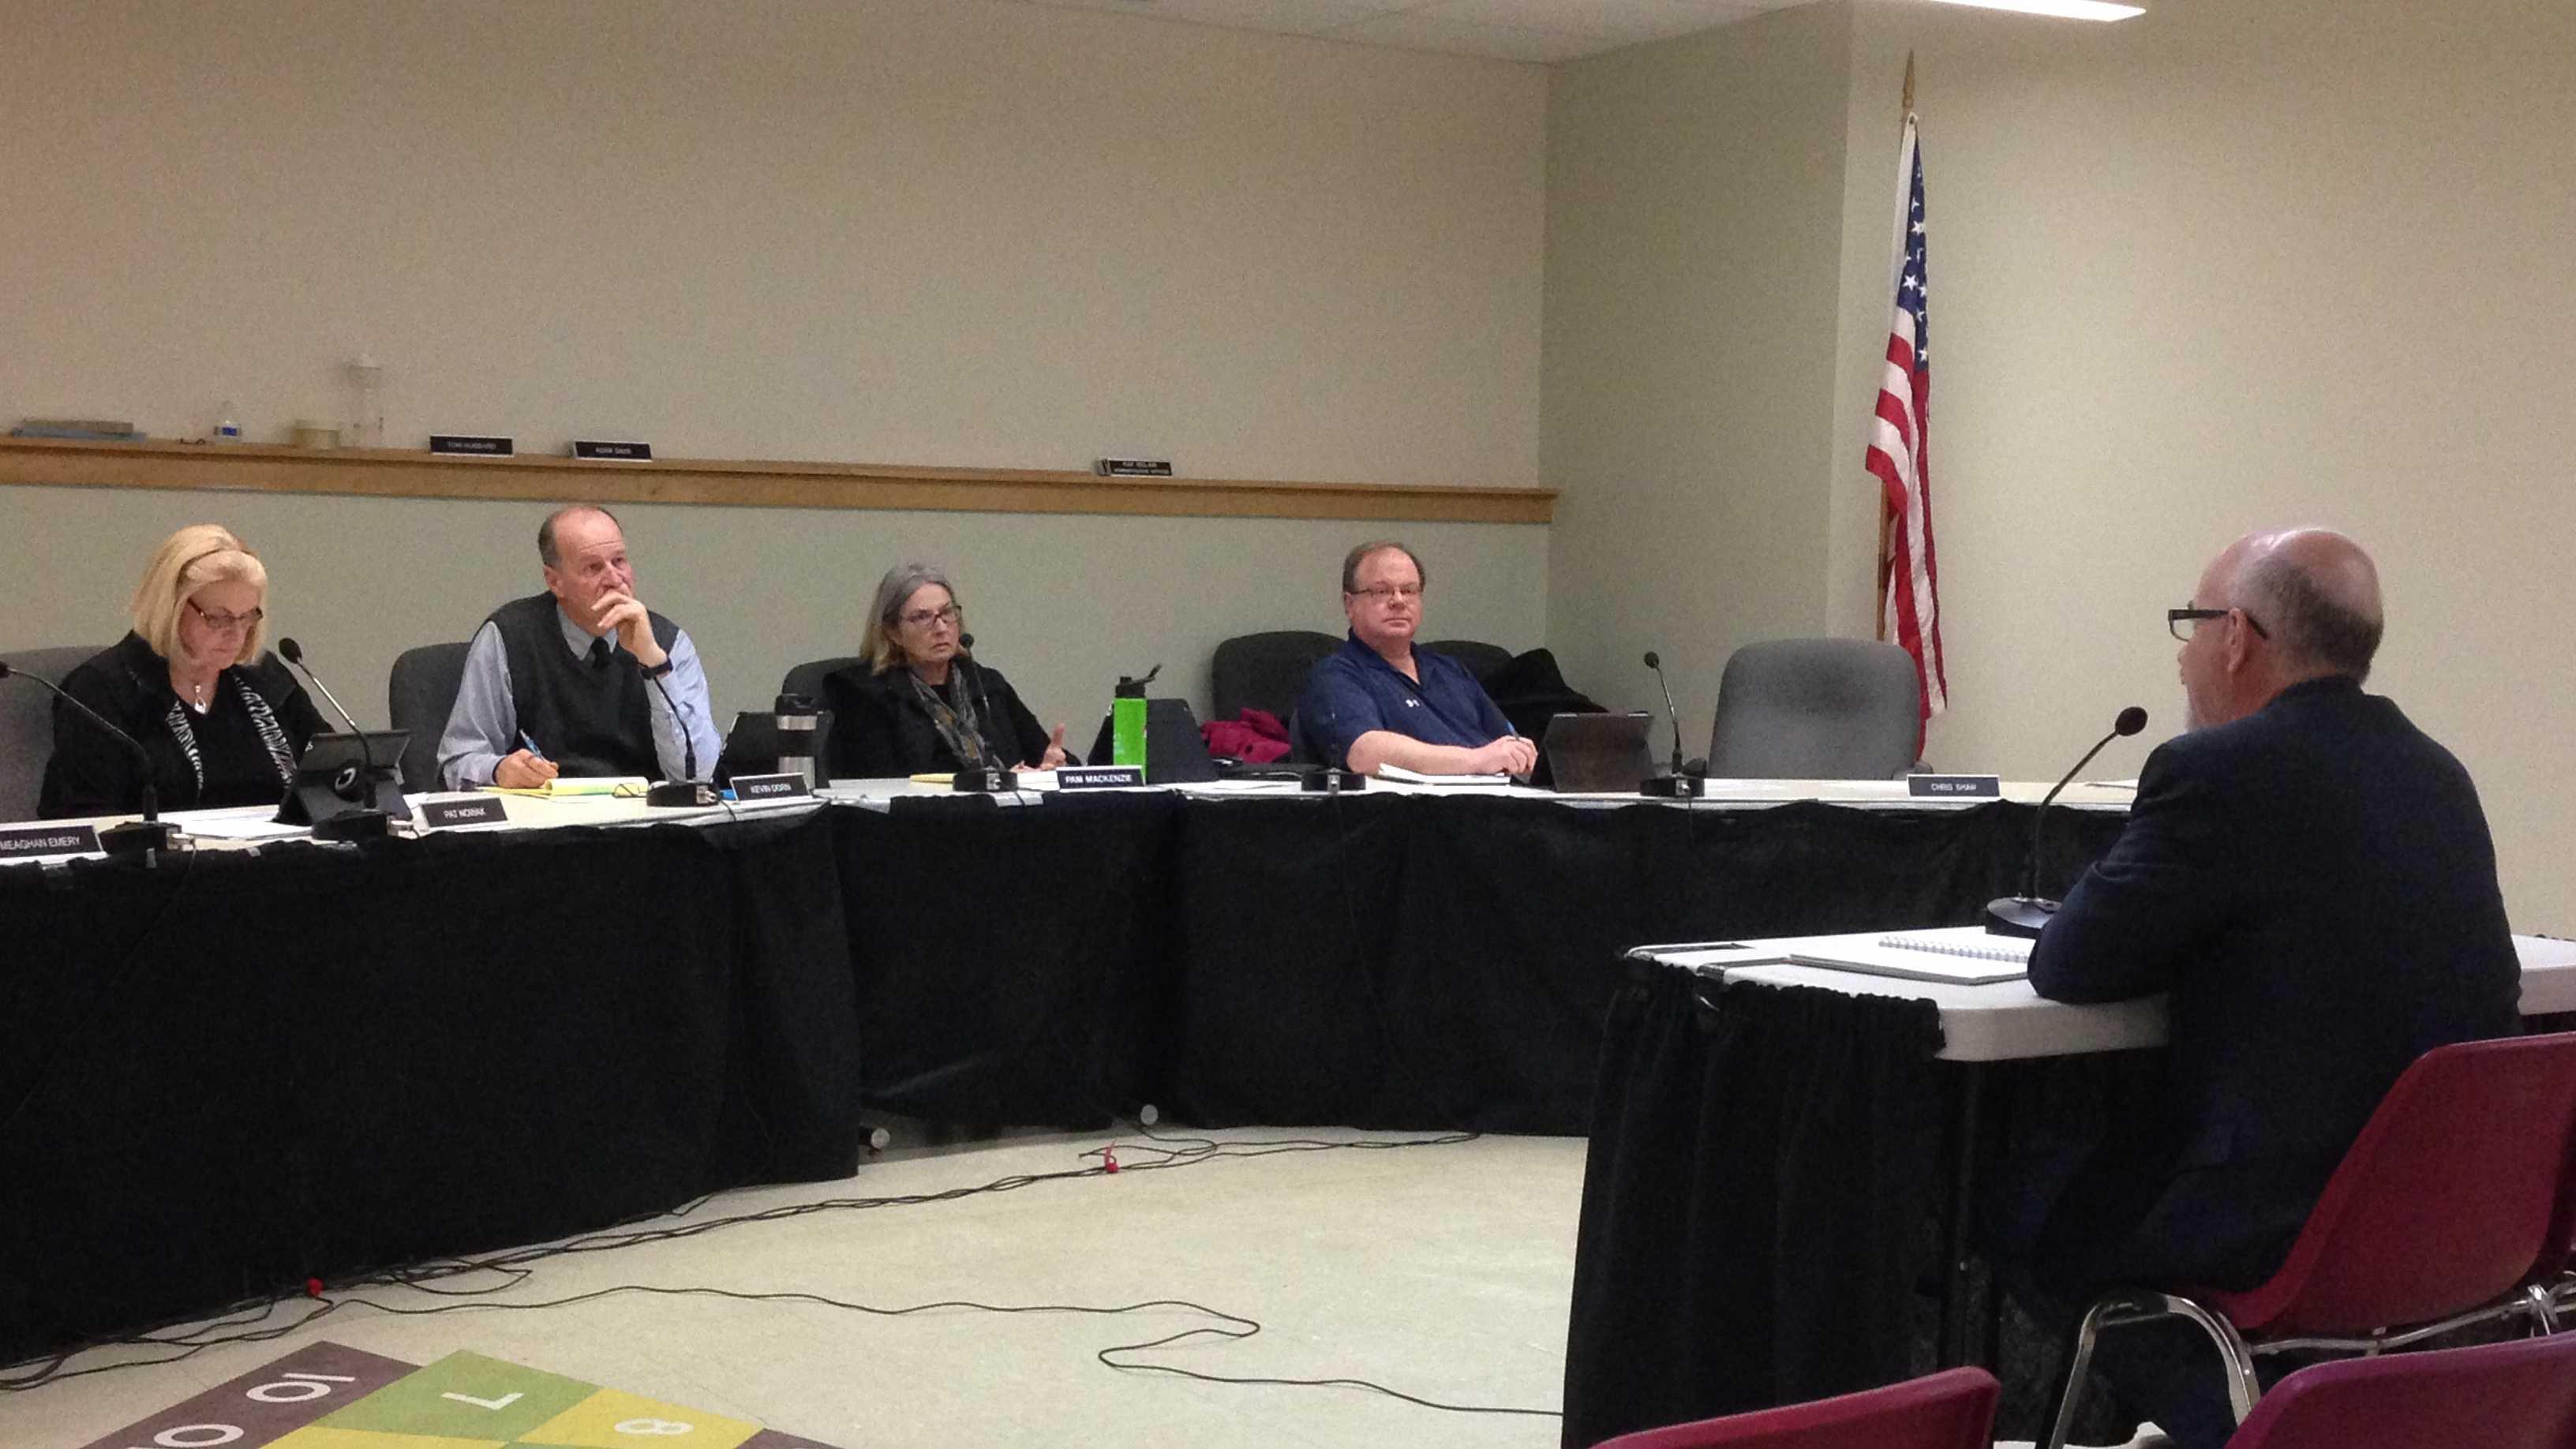 CCTA board member Steve Magowan briefed members of the South Burlington city council Saturday.